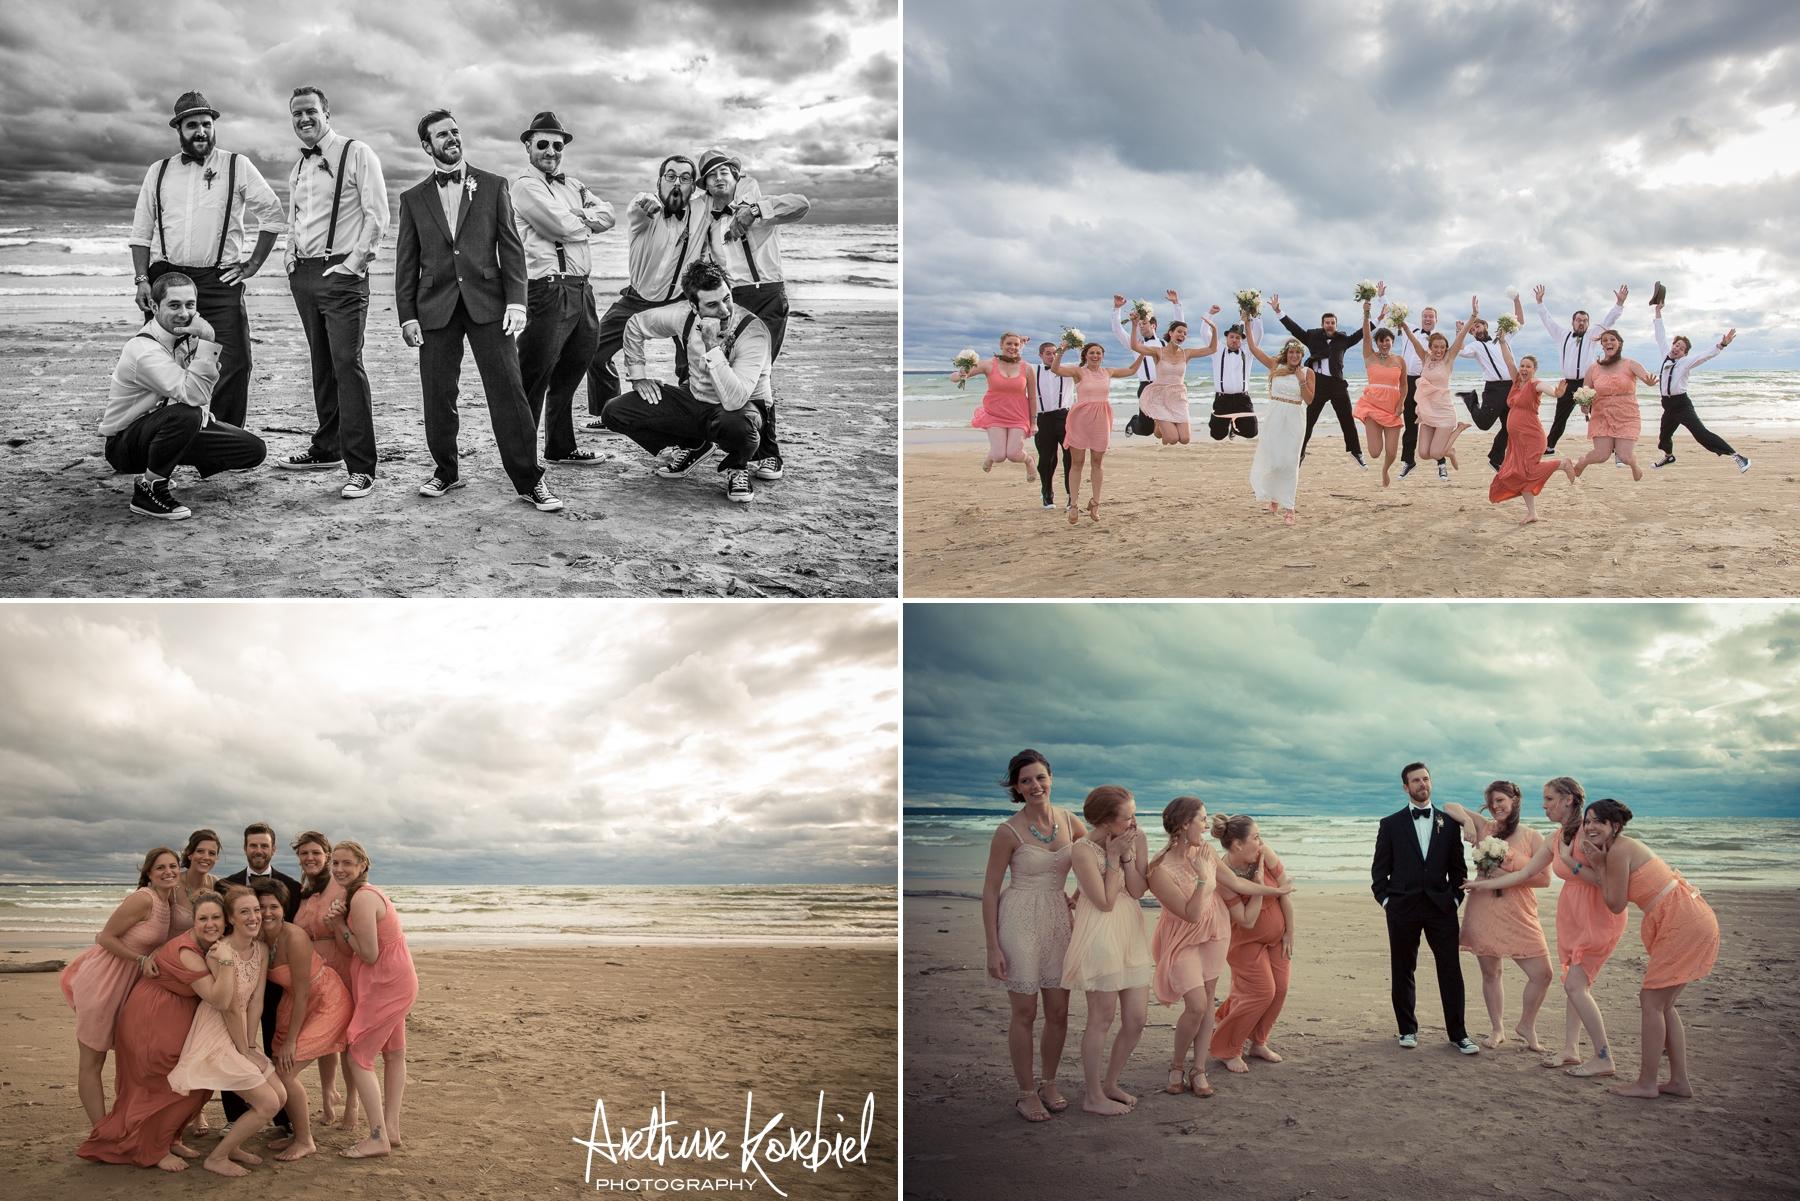 Arthur Korbiel Photography - London Engagement Photographer - Sauble Beach Barn Wedding - Samantha & Dan_008.jpg